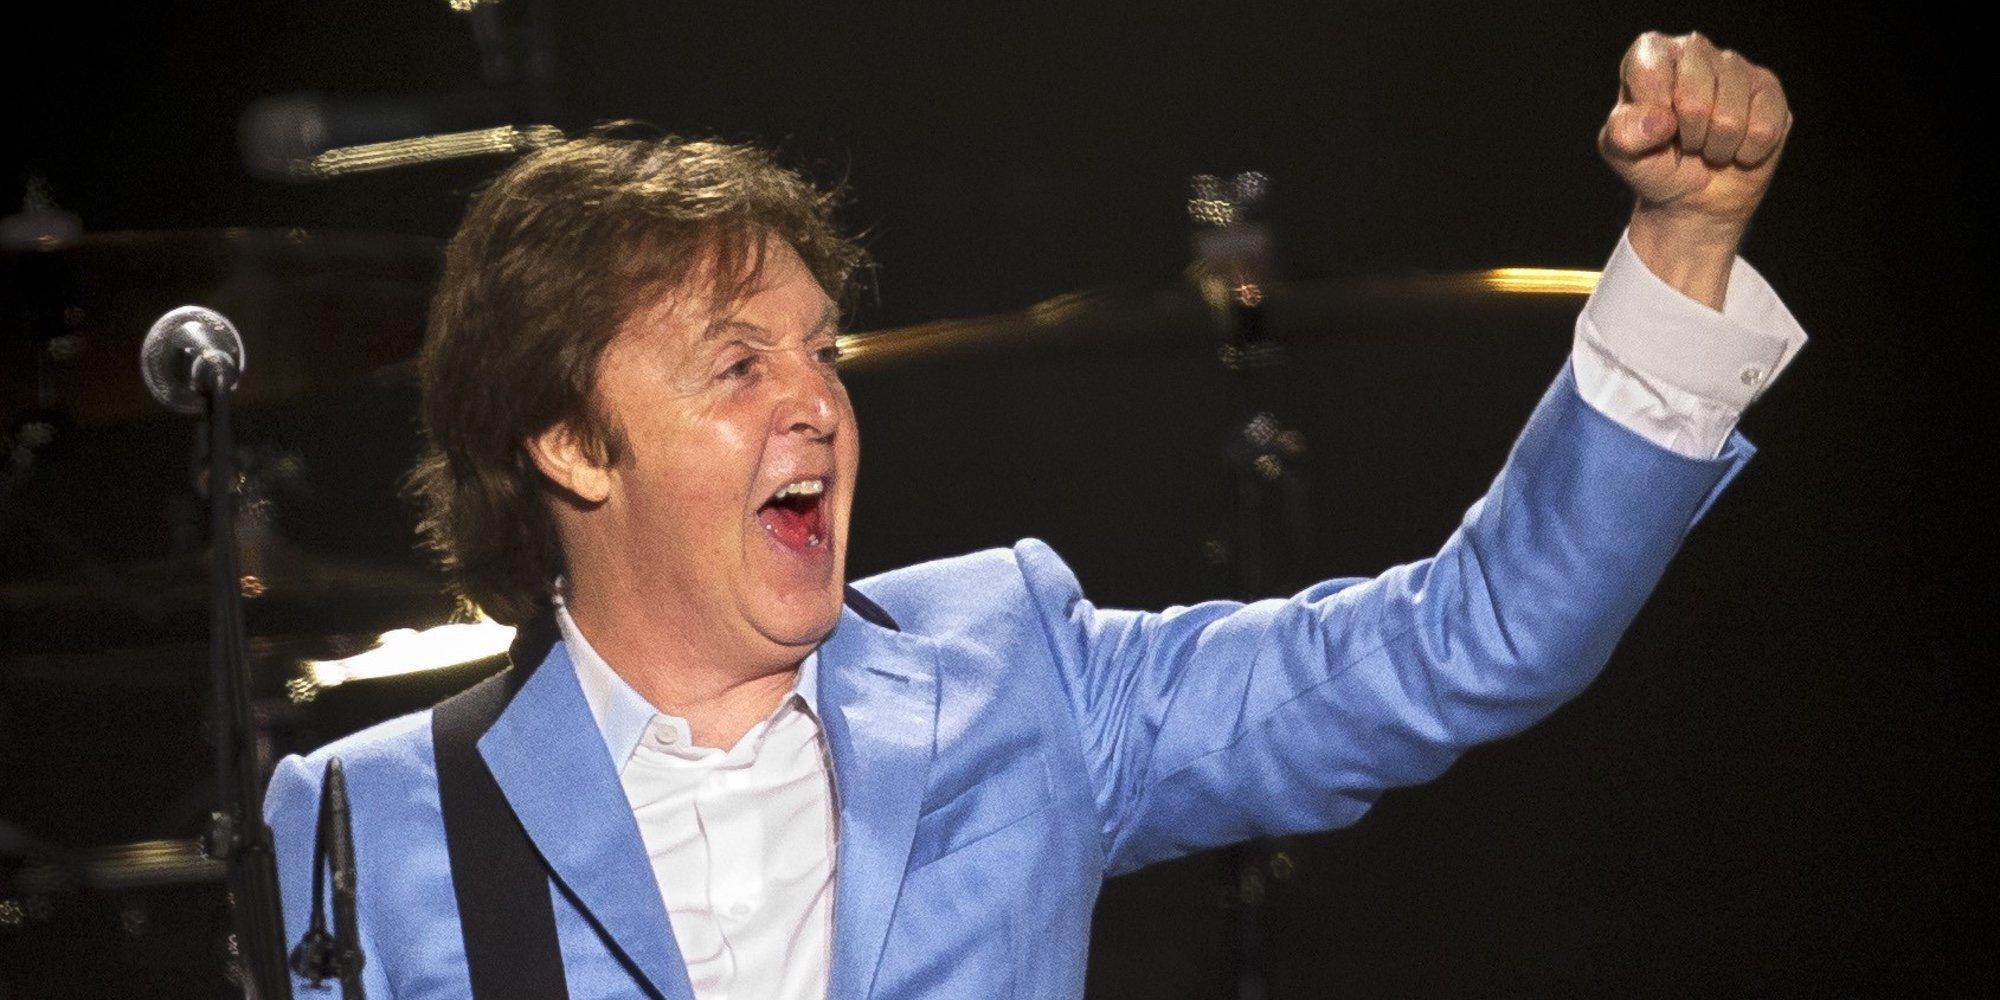 Paul McCartney revela los secretos sexuales de The Beatles